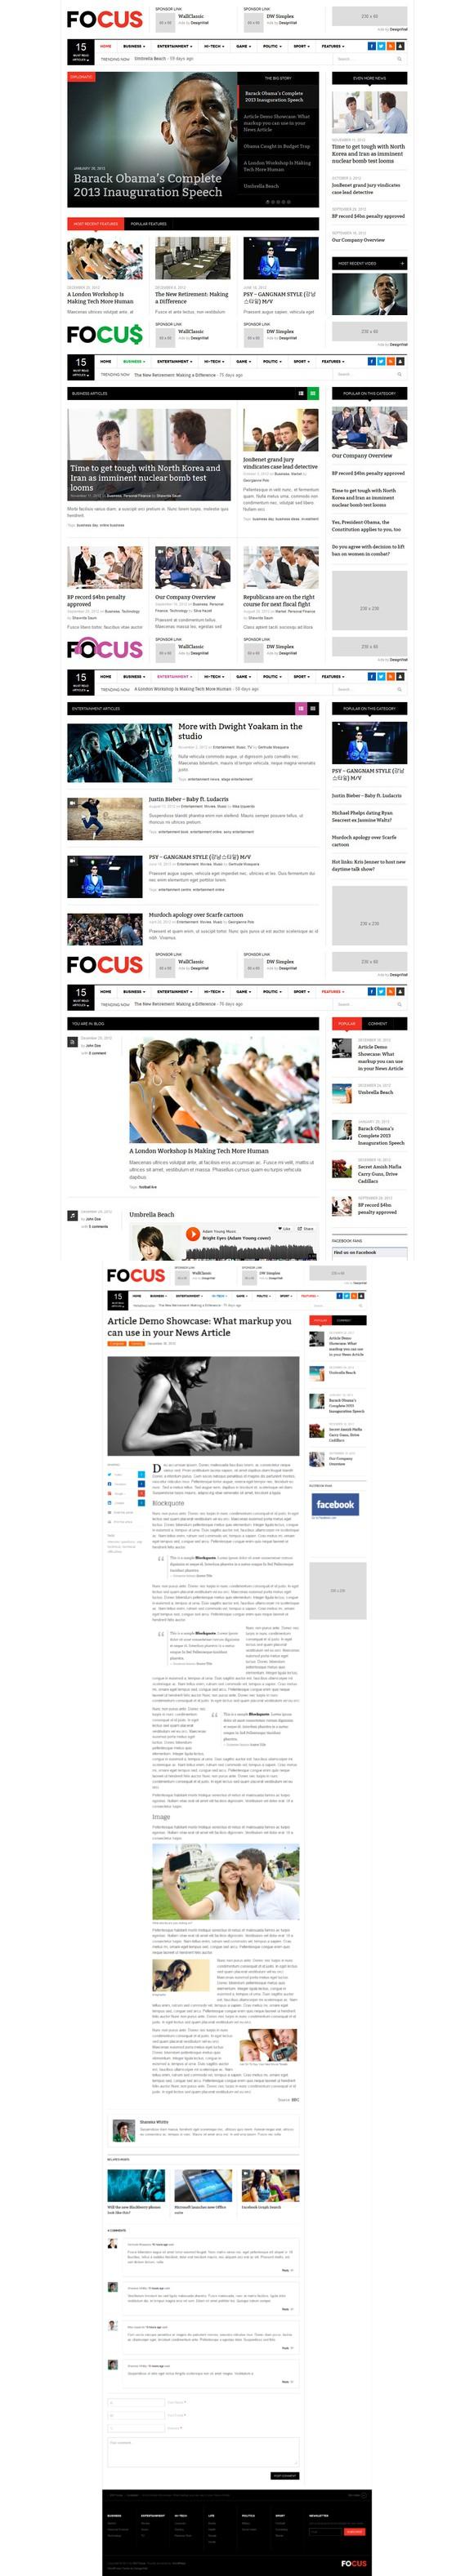 DW Focus - Responsive WordPress News. Bootstrap Templates. $49.00 ...